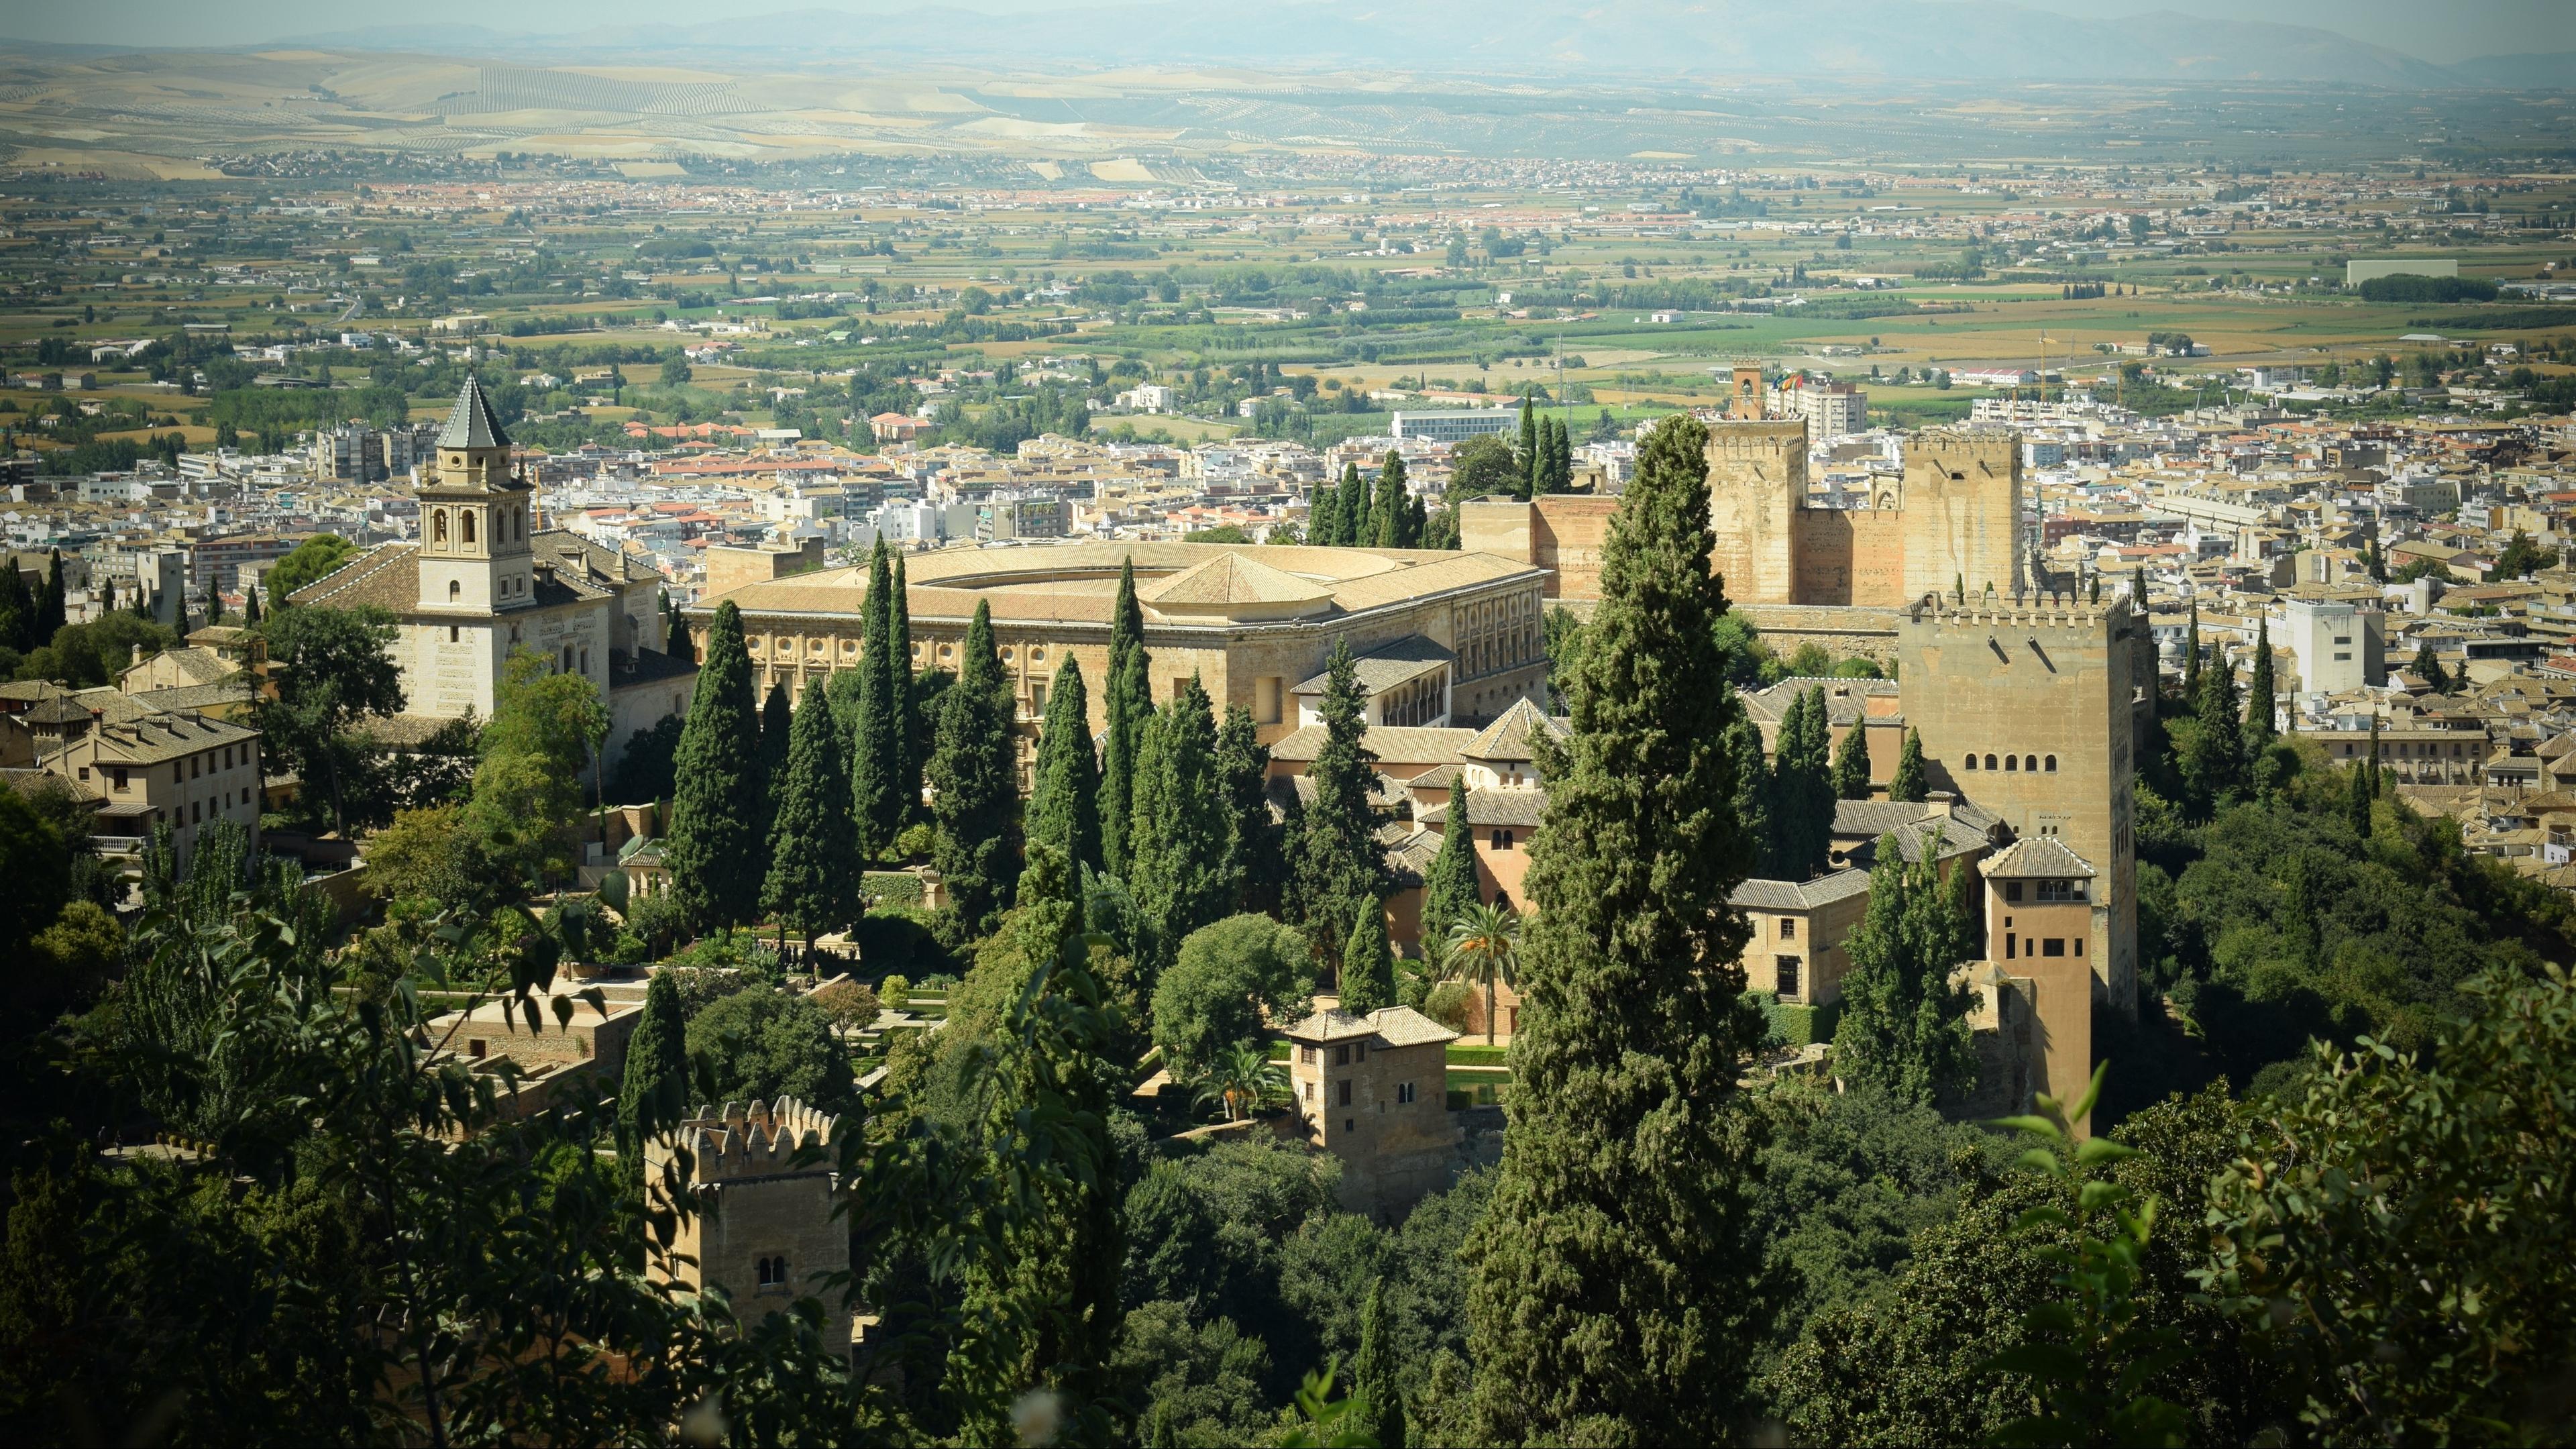 alhambra granada spain city top view 4k 1538066885 - alhambra, granada, spain, city, top view 4k - Spain, granada, alhambra